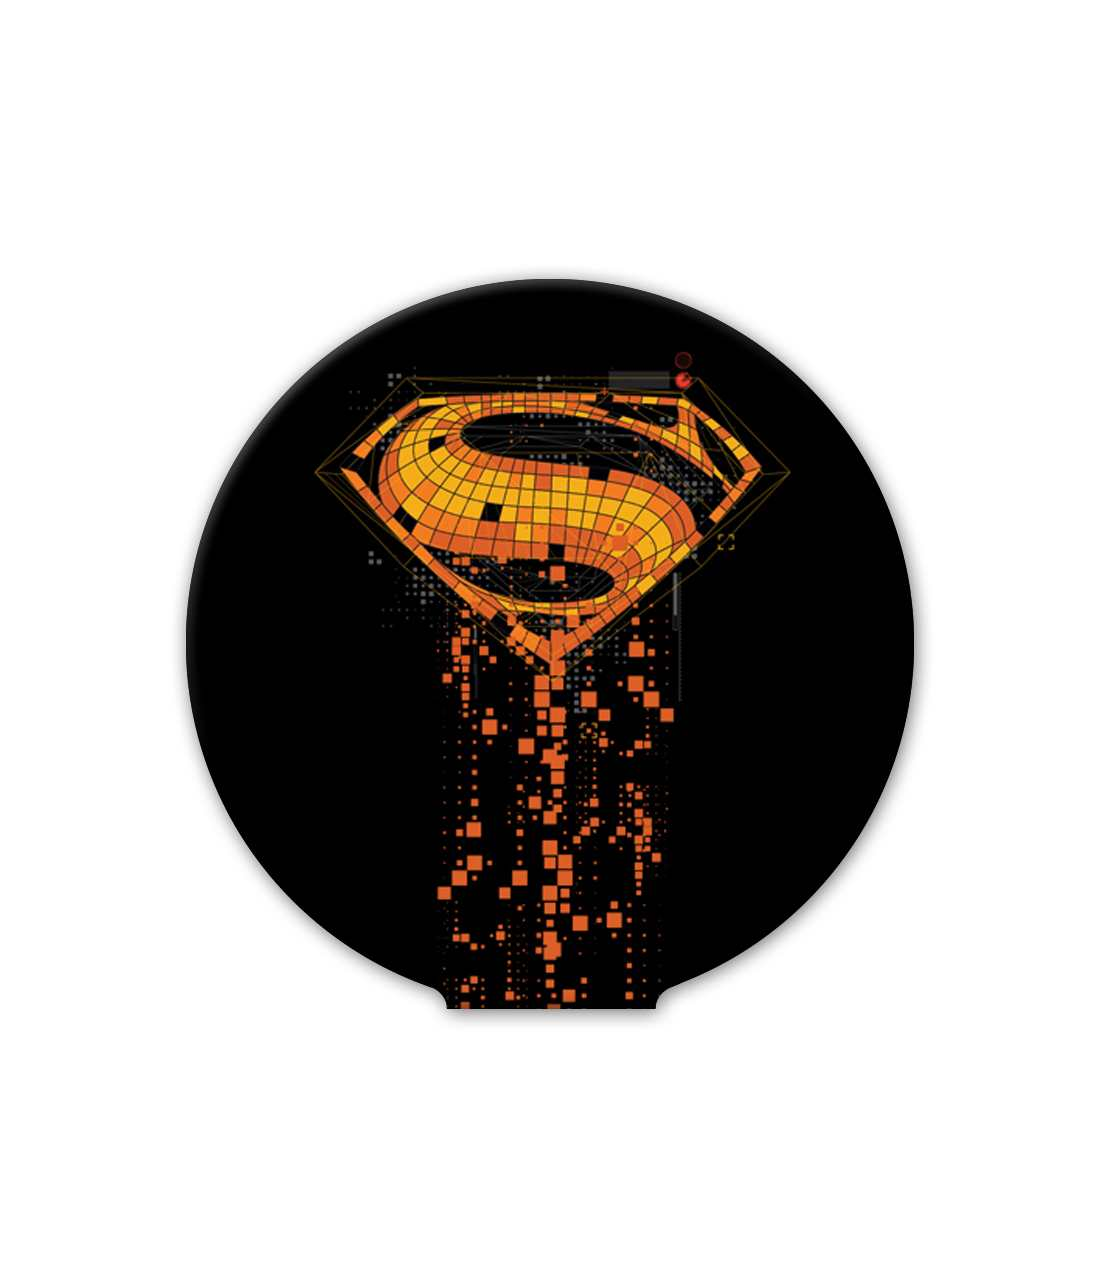 Superman Mosaic - Macmerise Sticky Pad